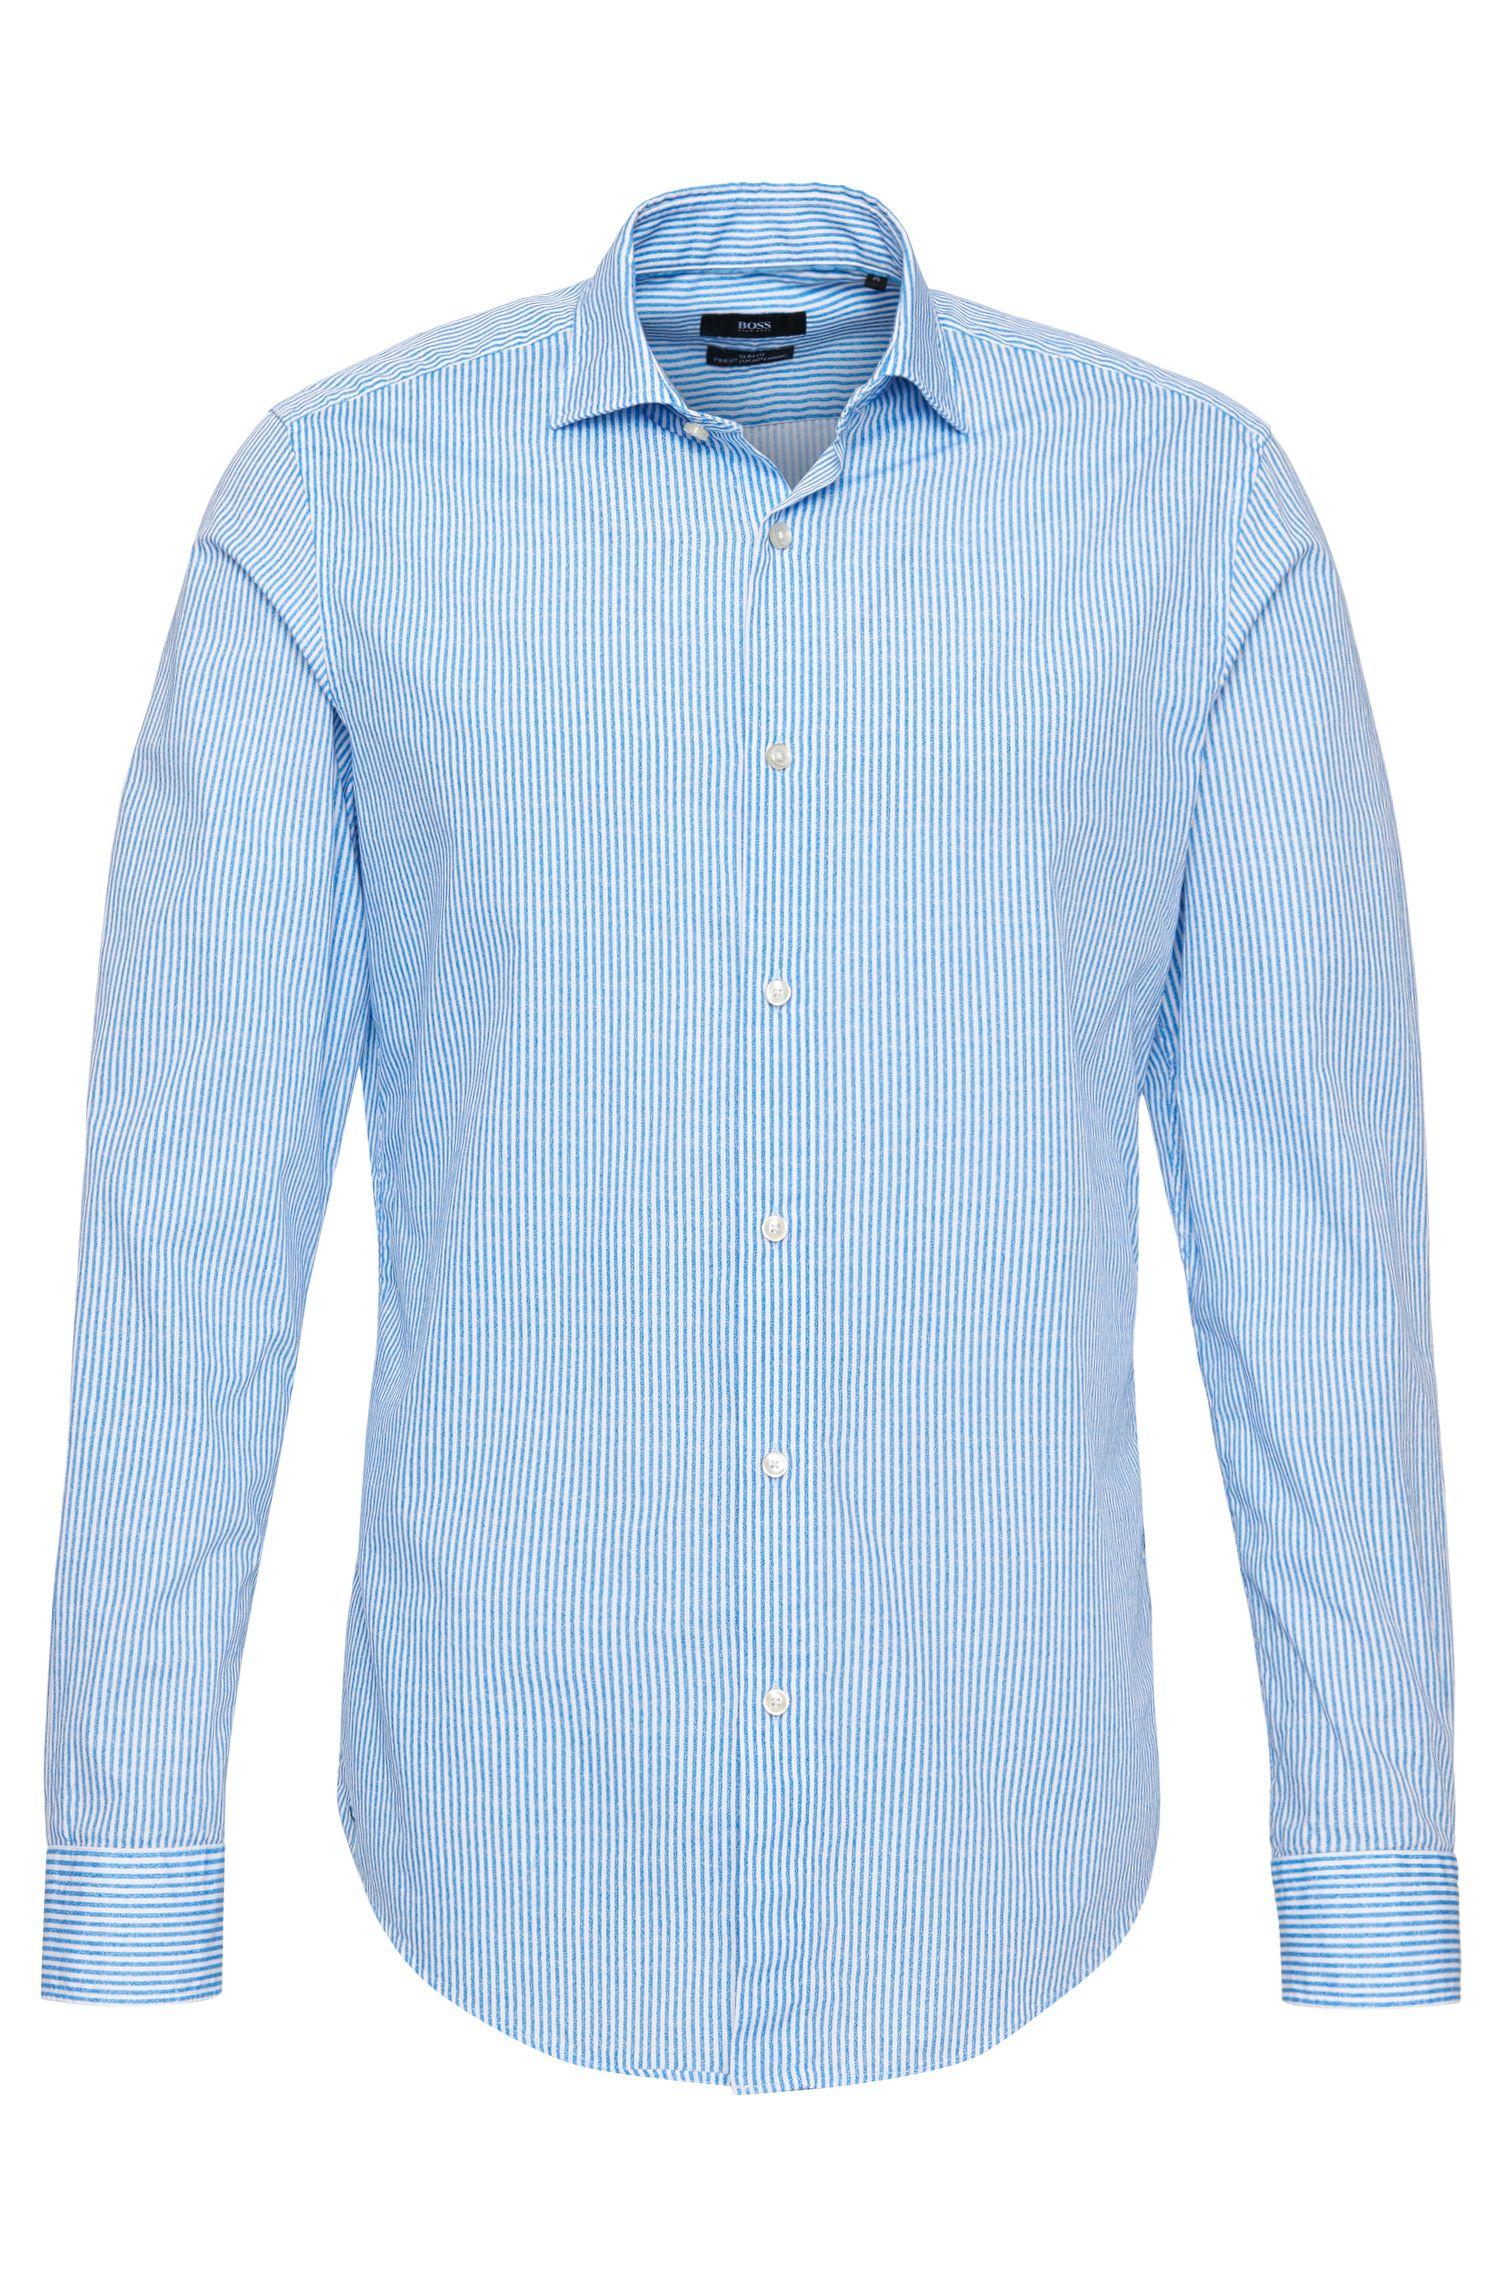 'Ridley' | Slim Fit, Cotton Button Down Shirt